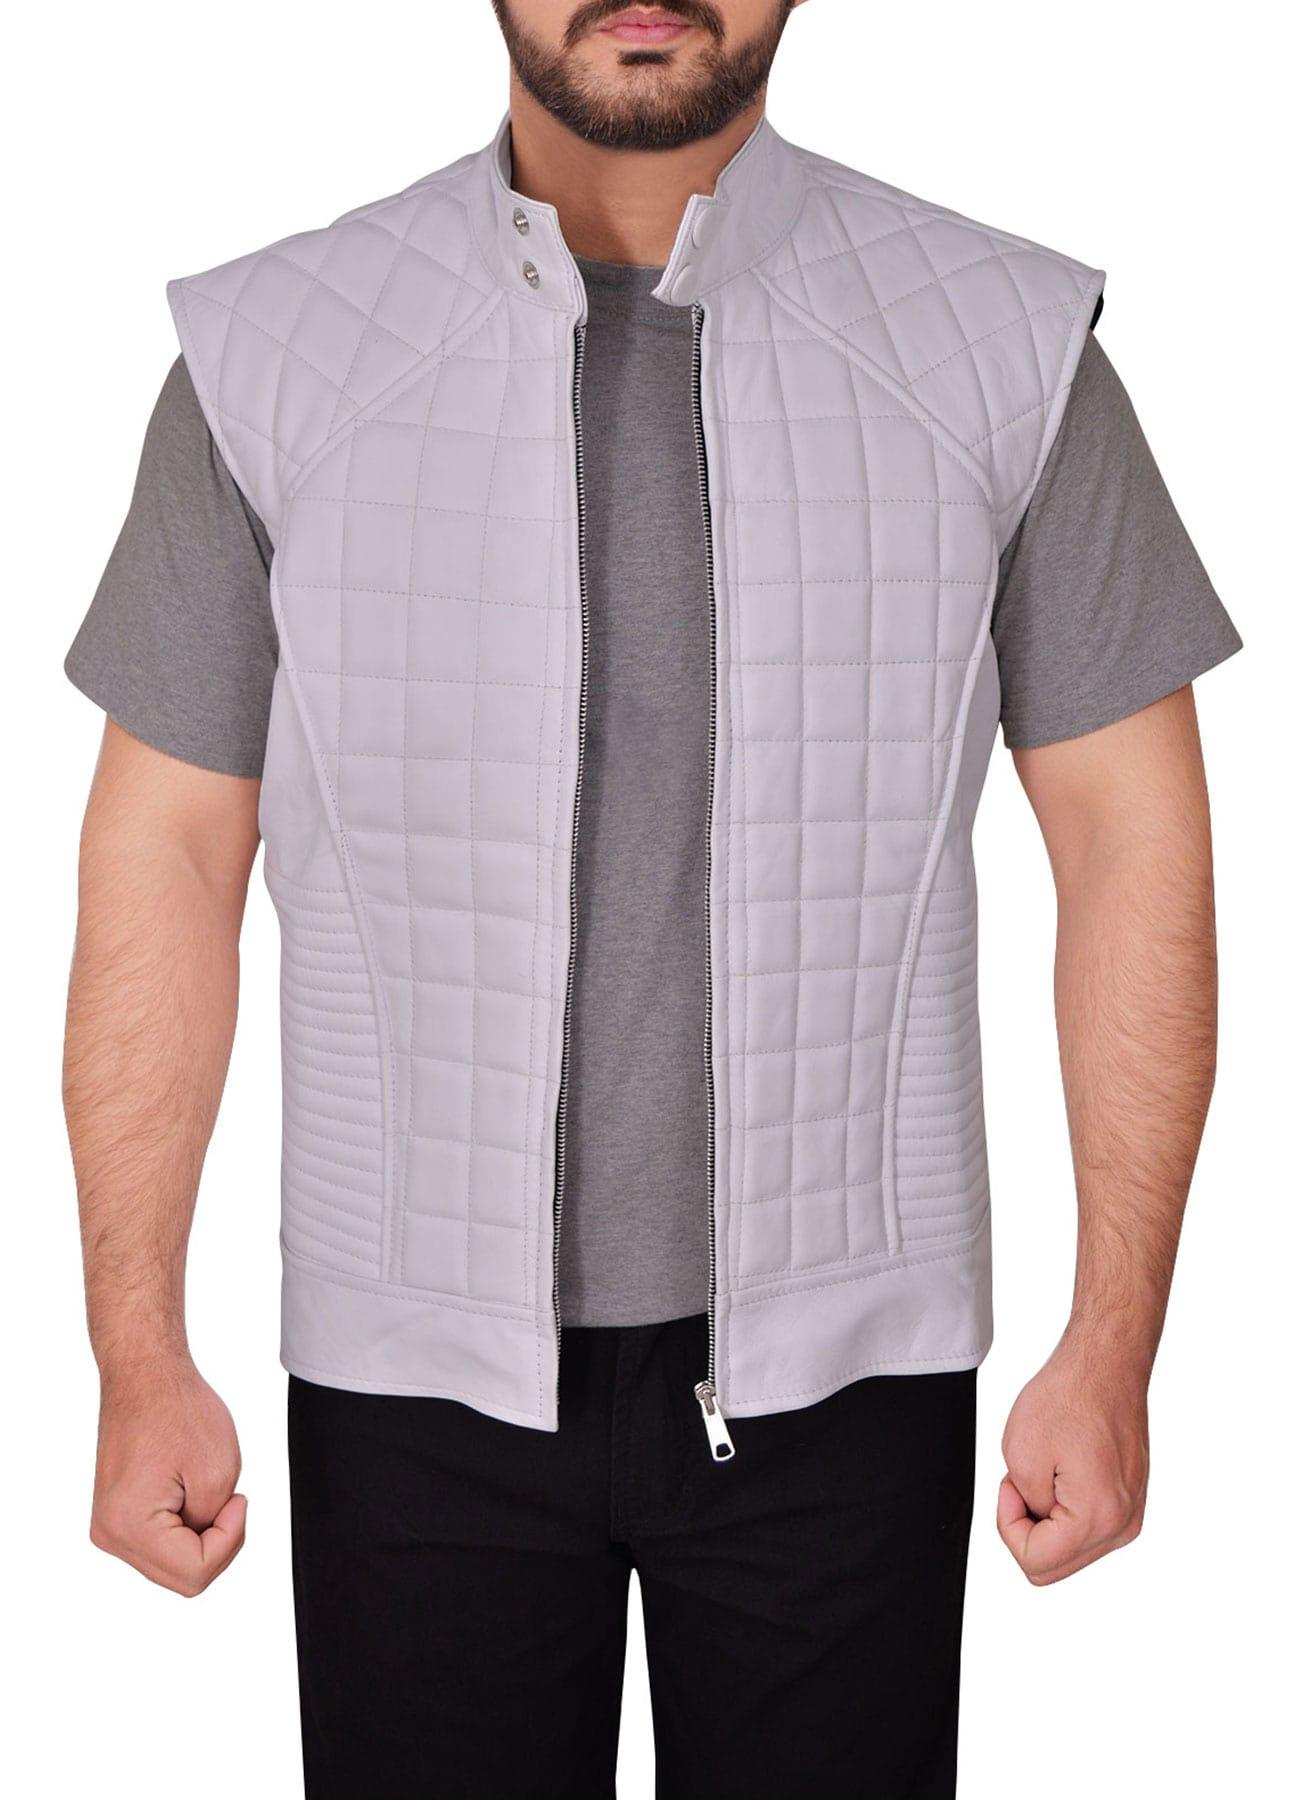 Stylish Men Outfit White Faux Leather Vest